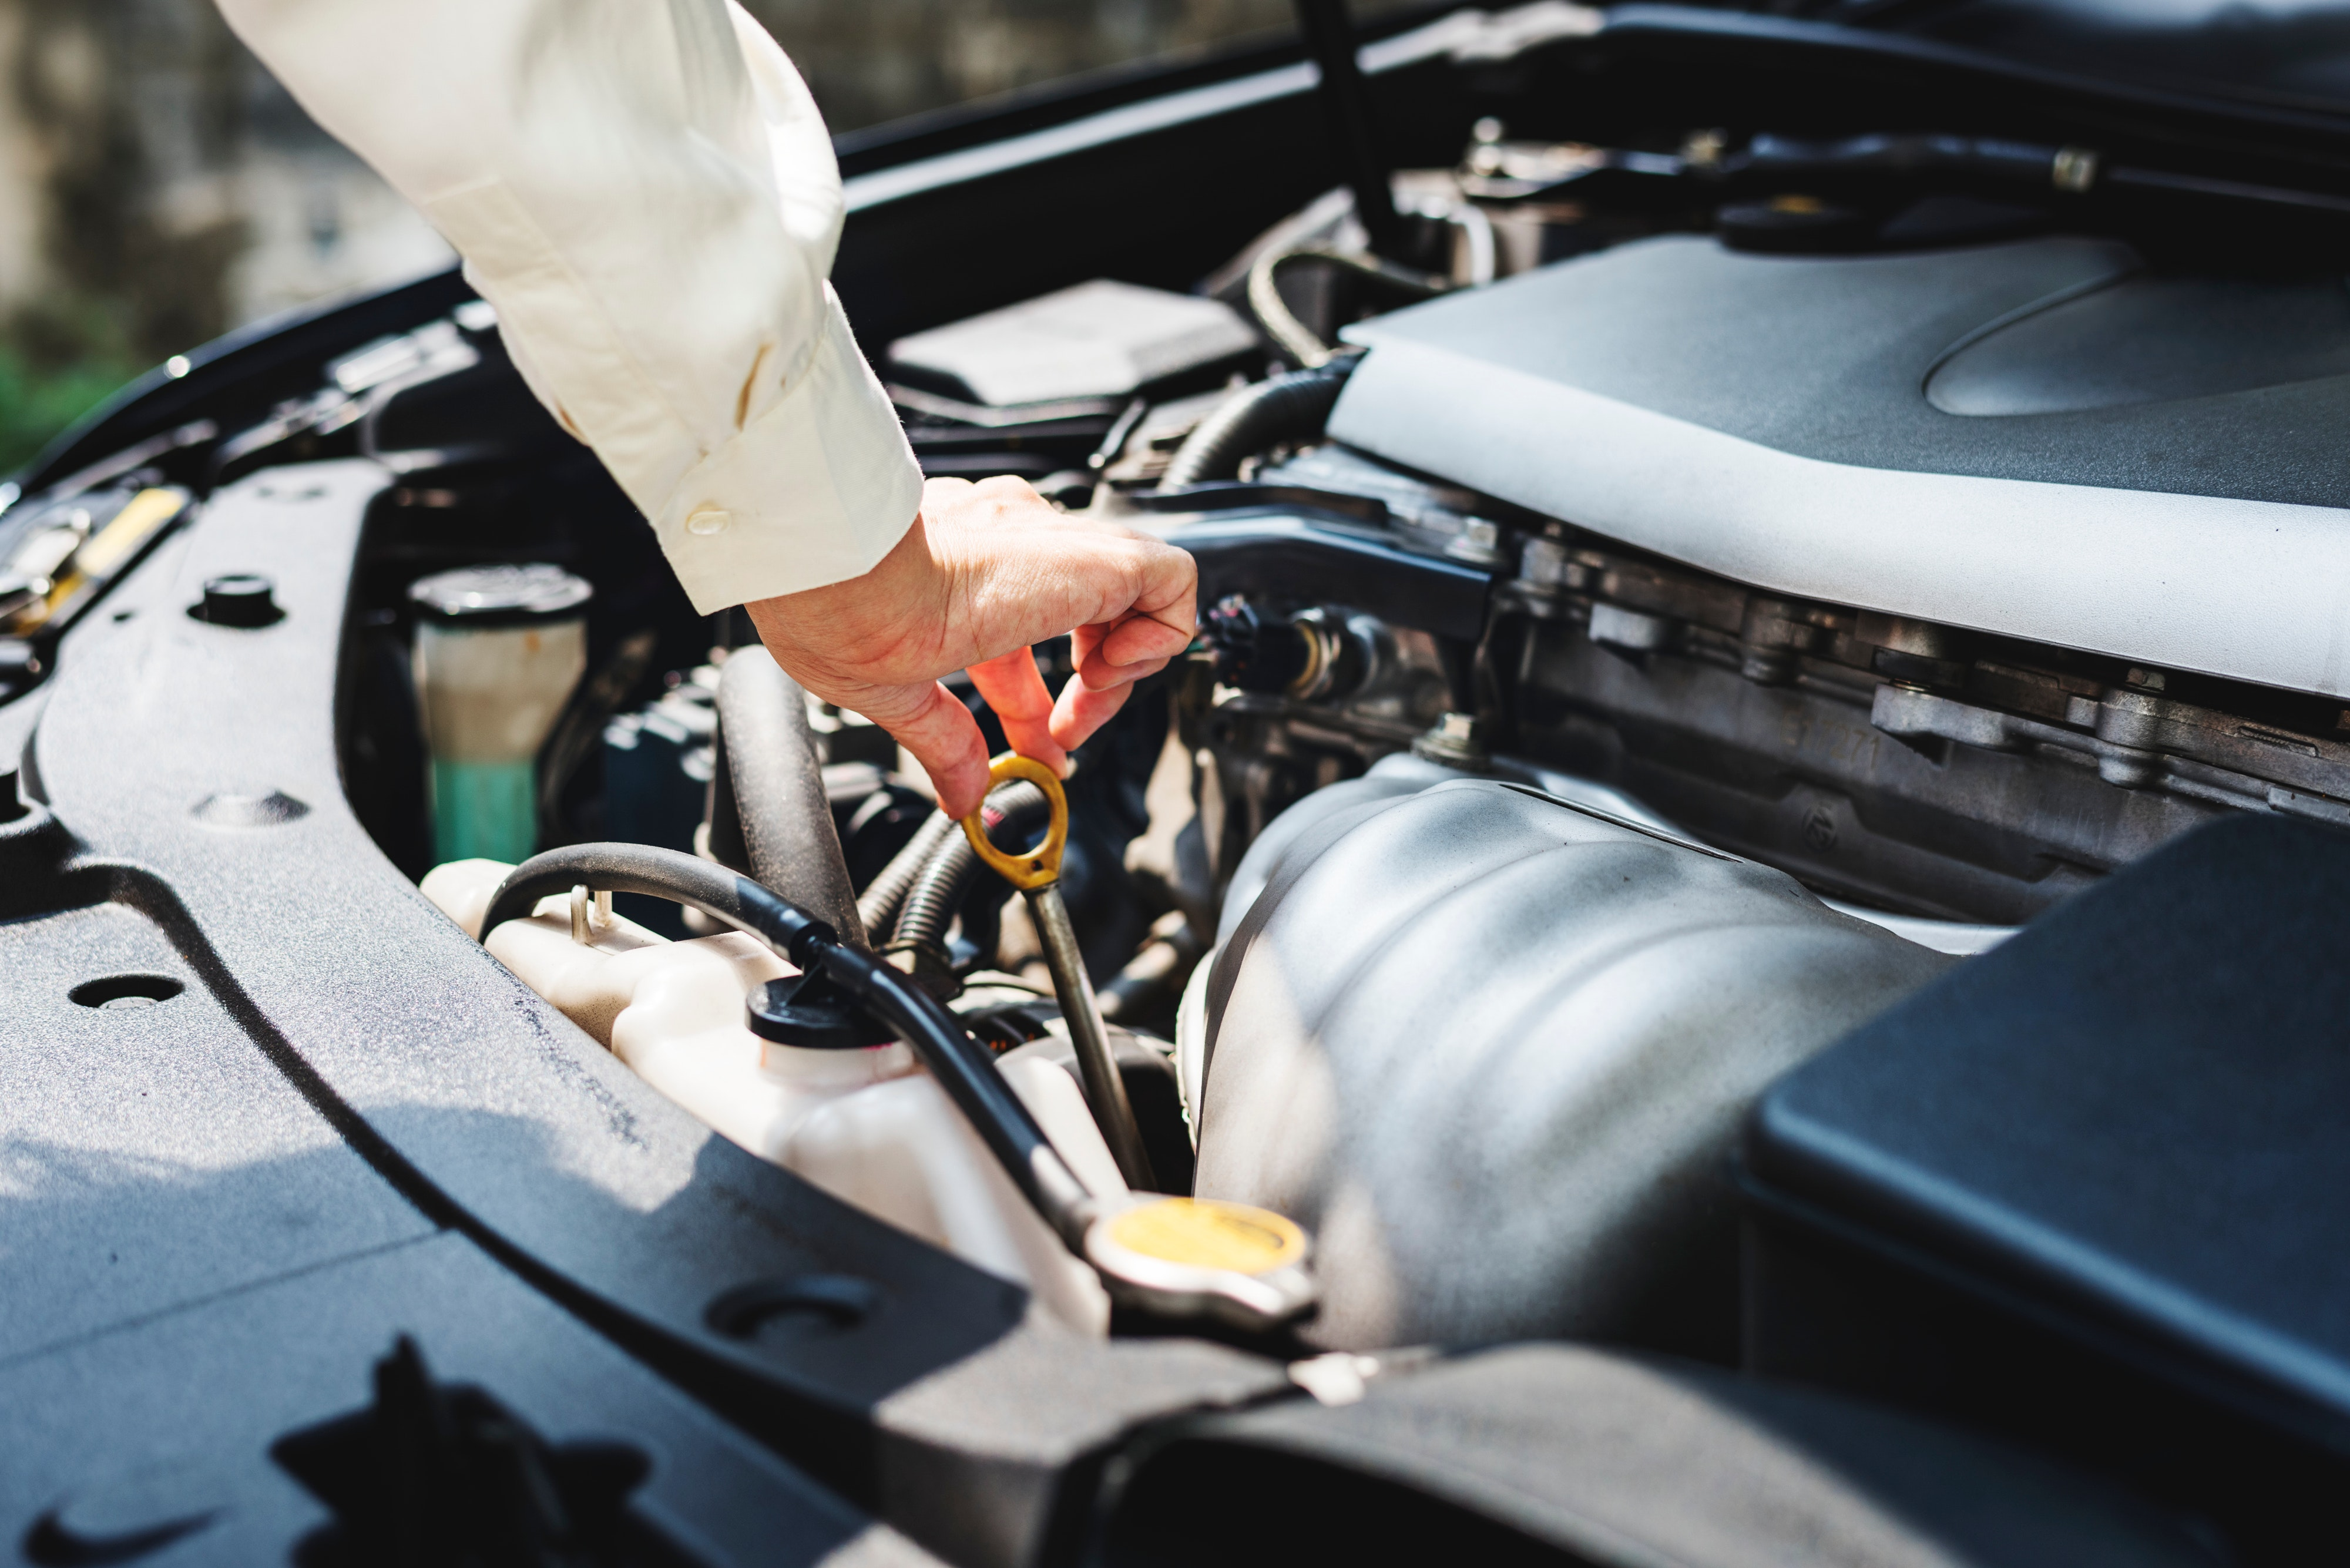 Kia Repair and Maintenance in Missouri City, TX